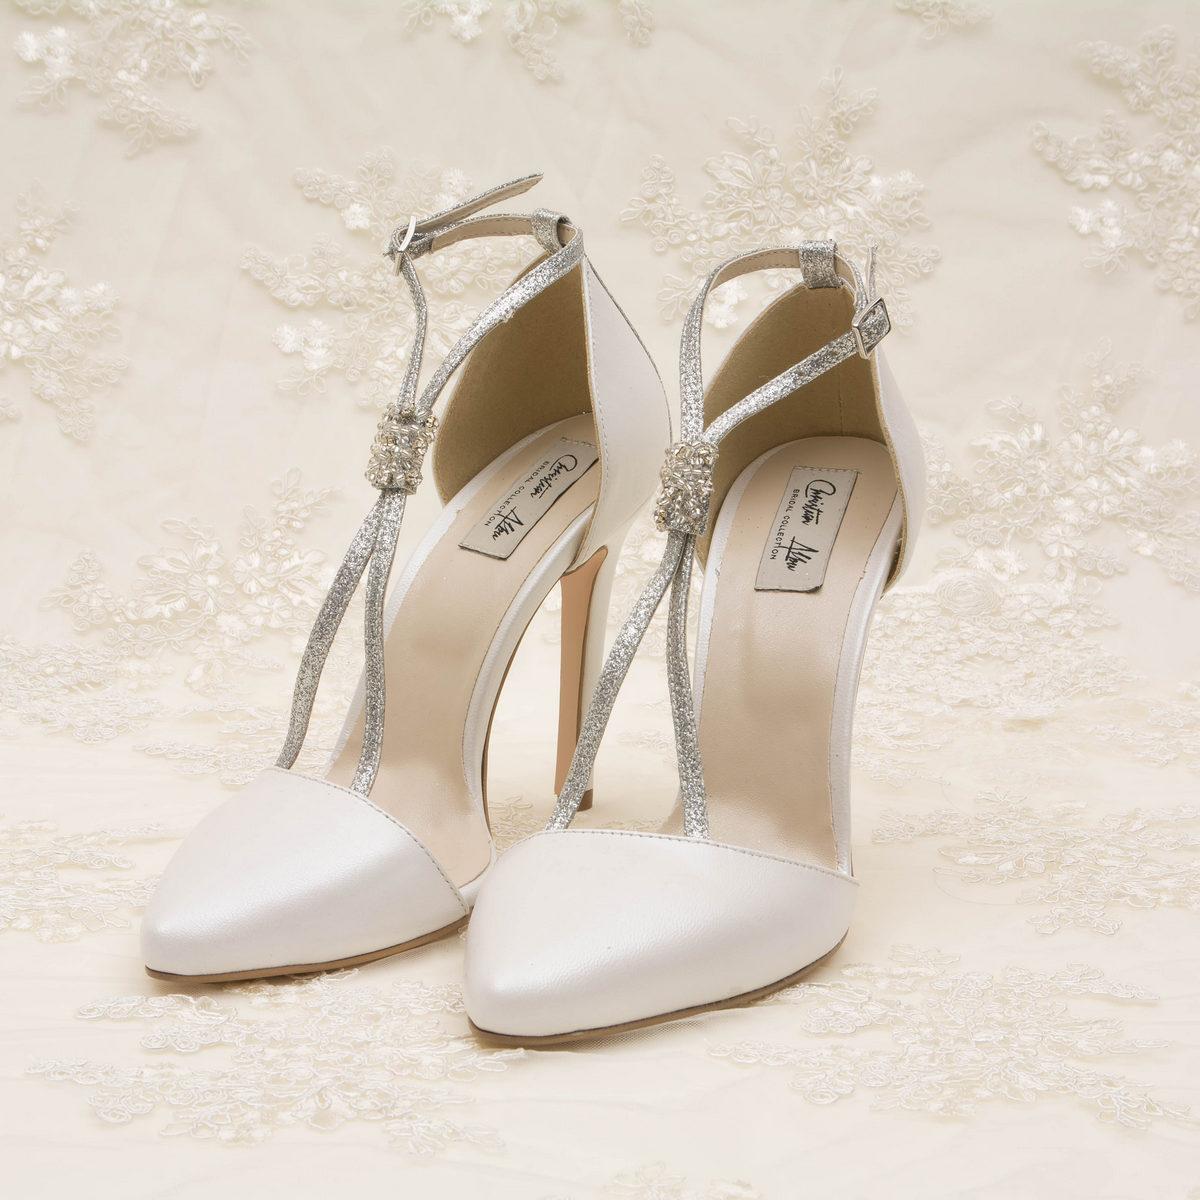 Pantofi Mireasa Pantofi Mireasa